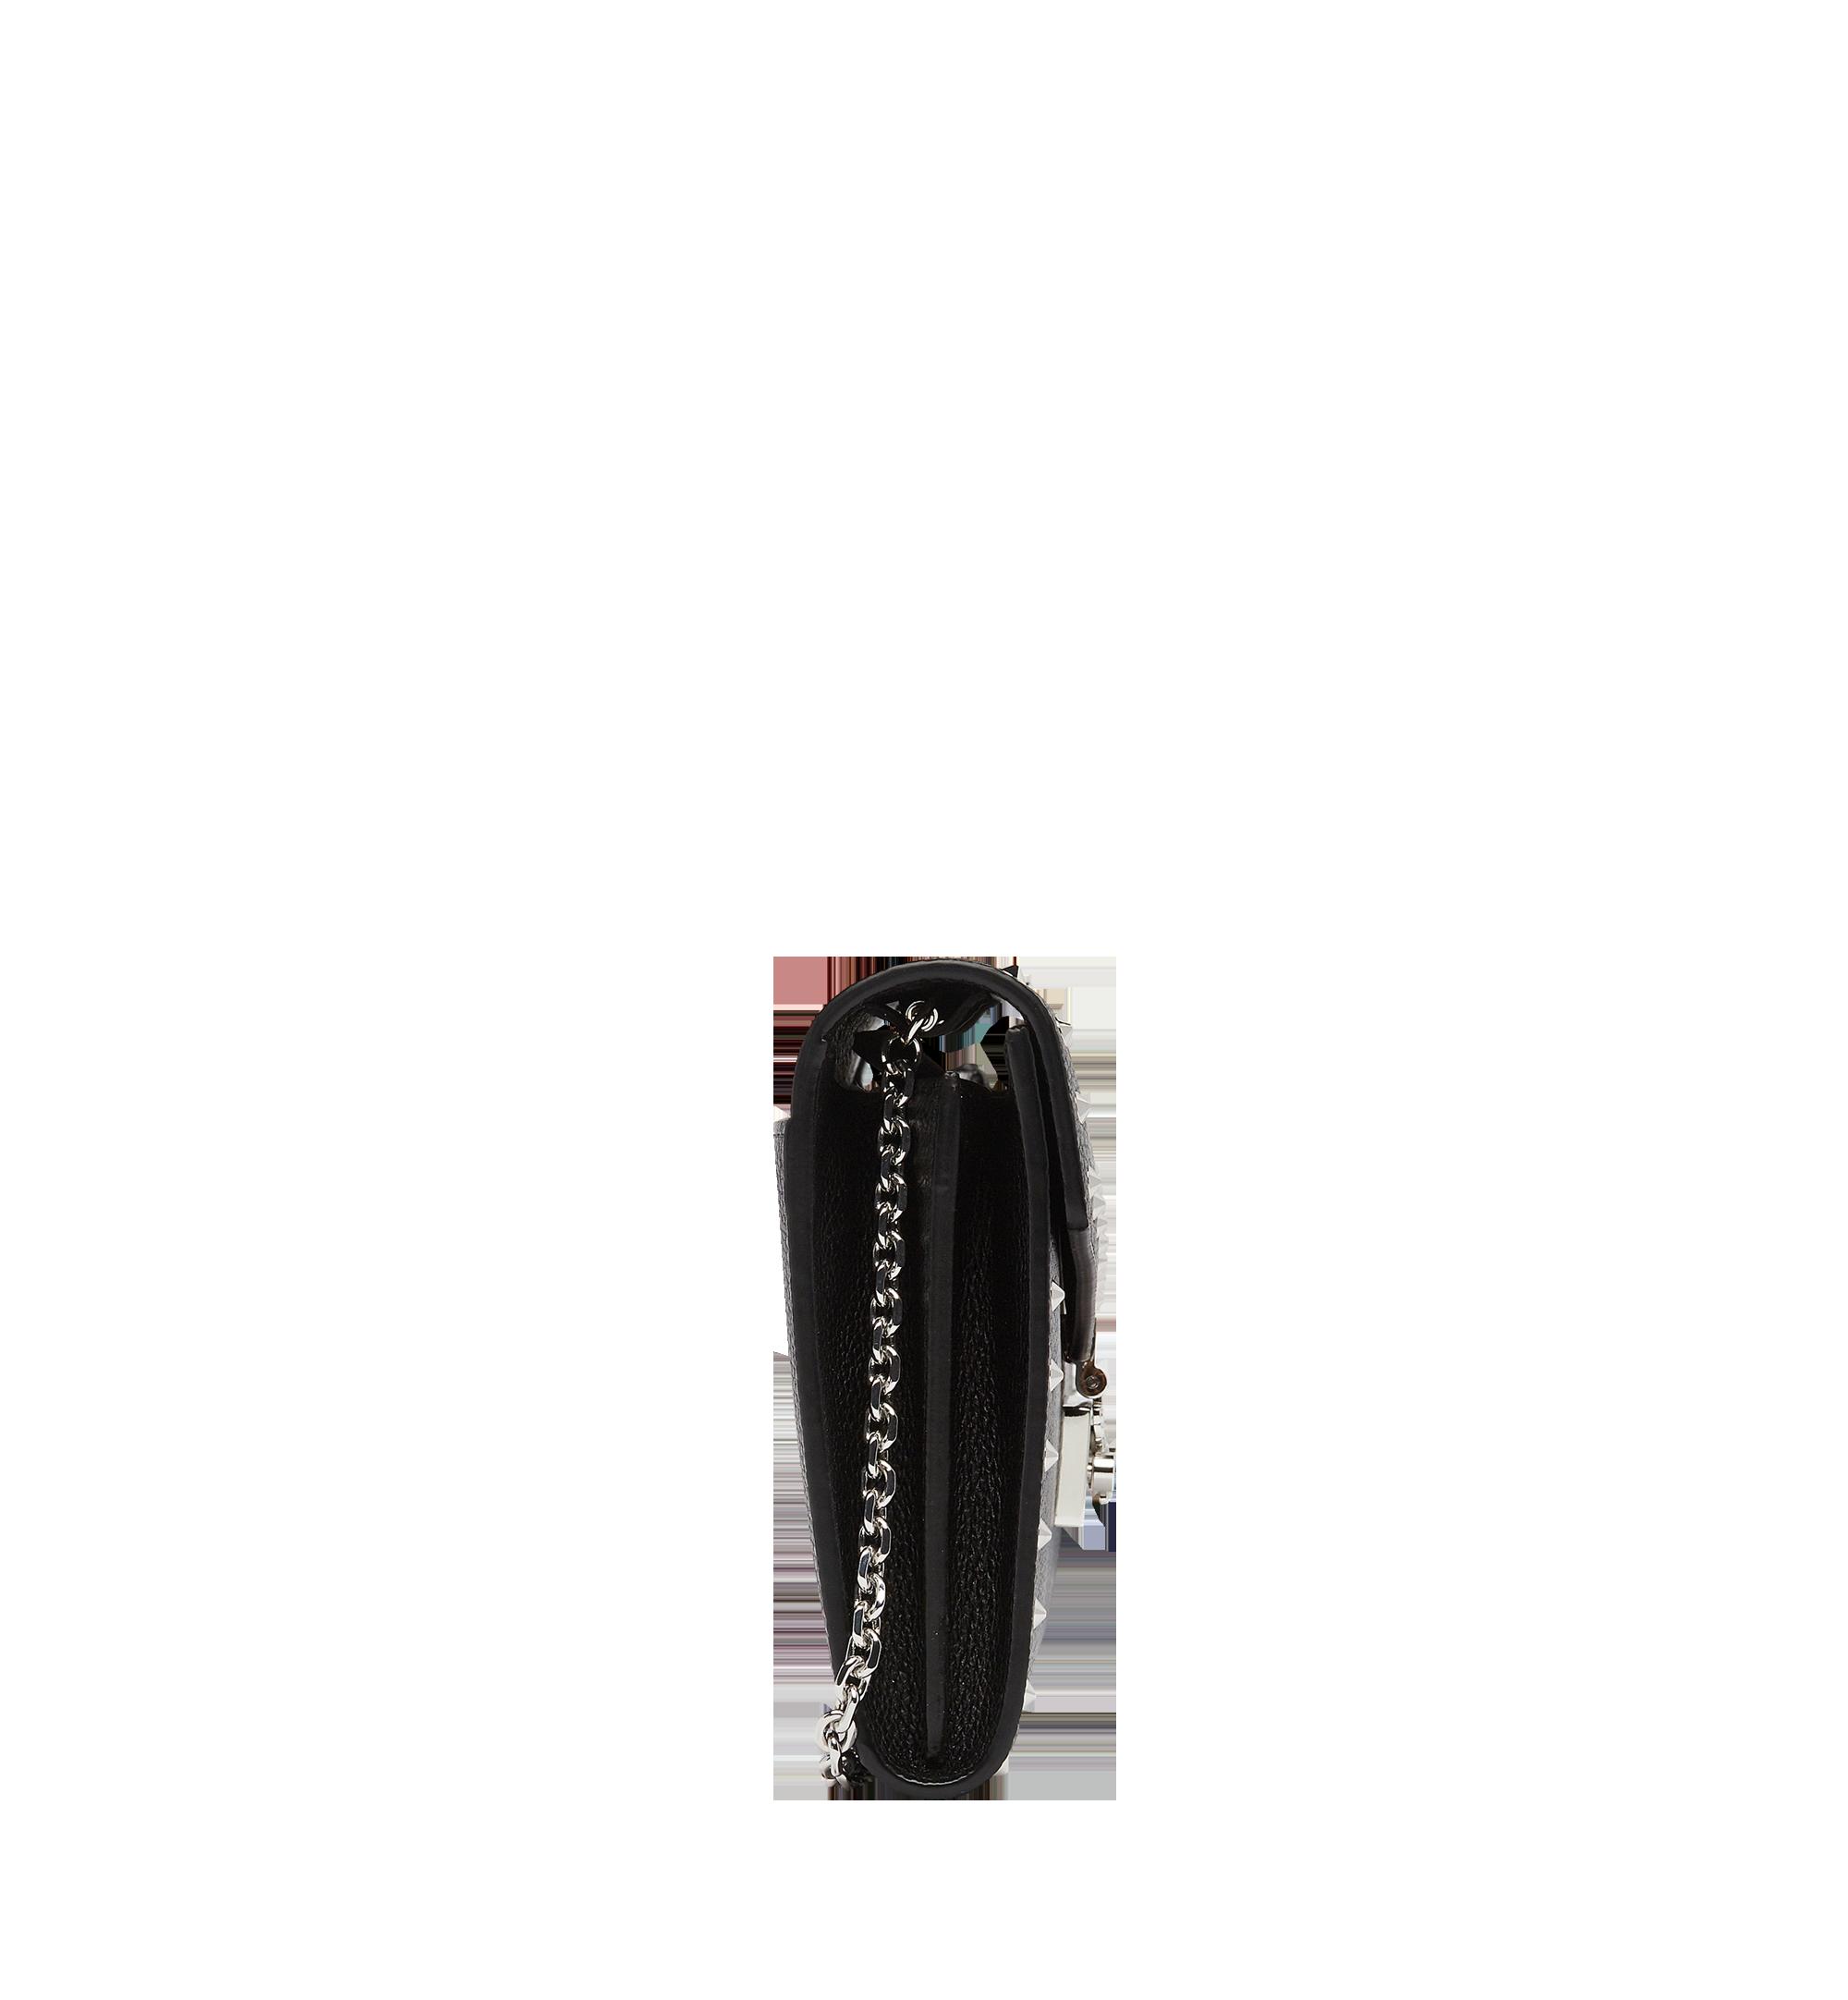 MCM Patricia鉚釘輪廓皮革歐式錢包 Black MYL8APA19BK001 更多視圖 2